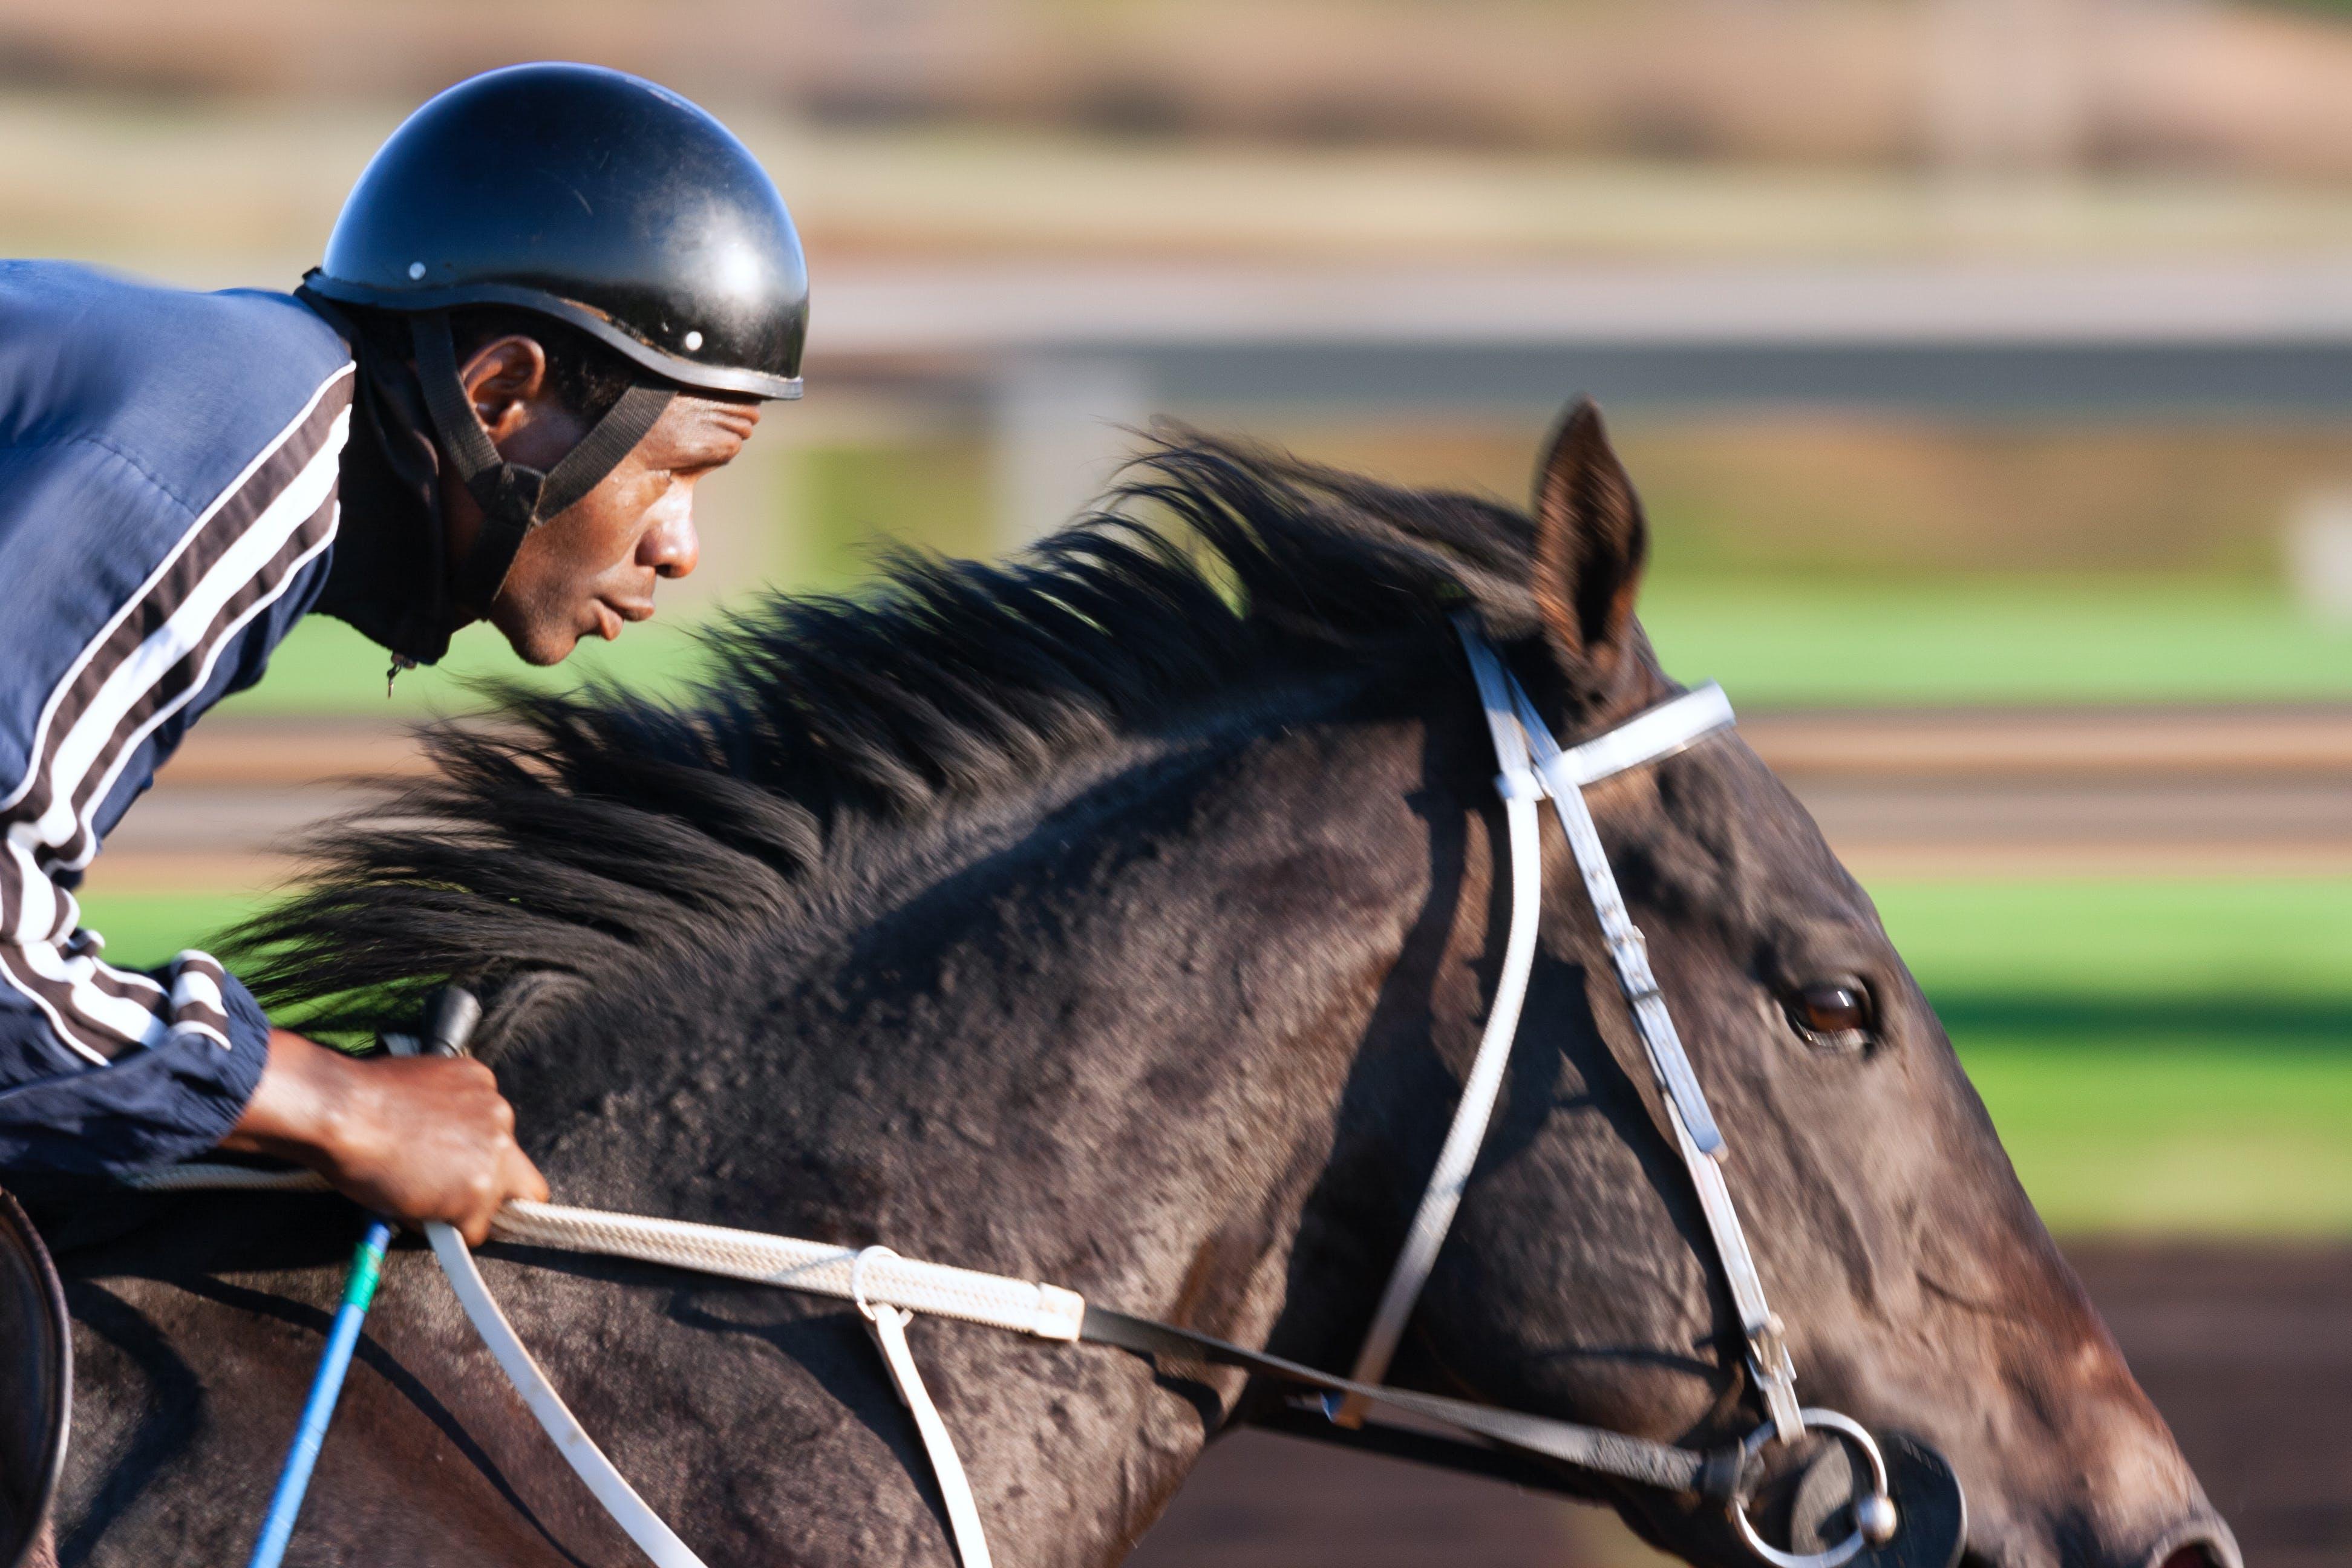 Tilt Shift Focus Photography of Man Riding Horse